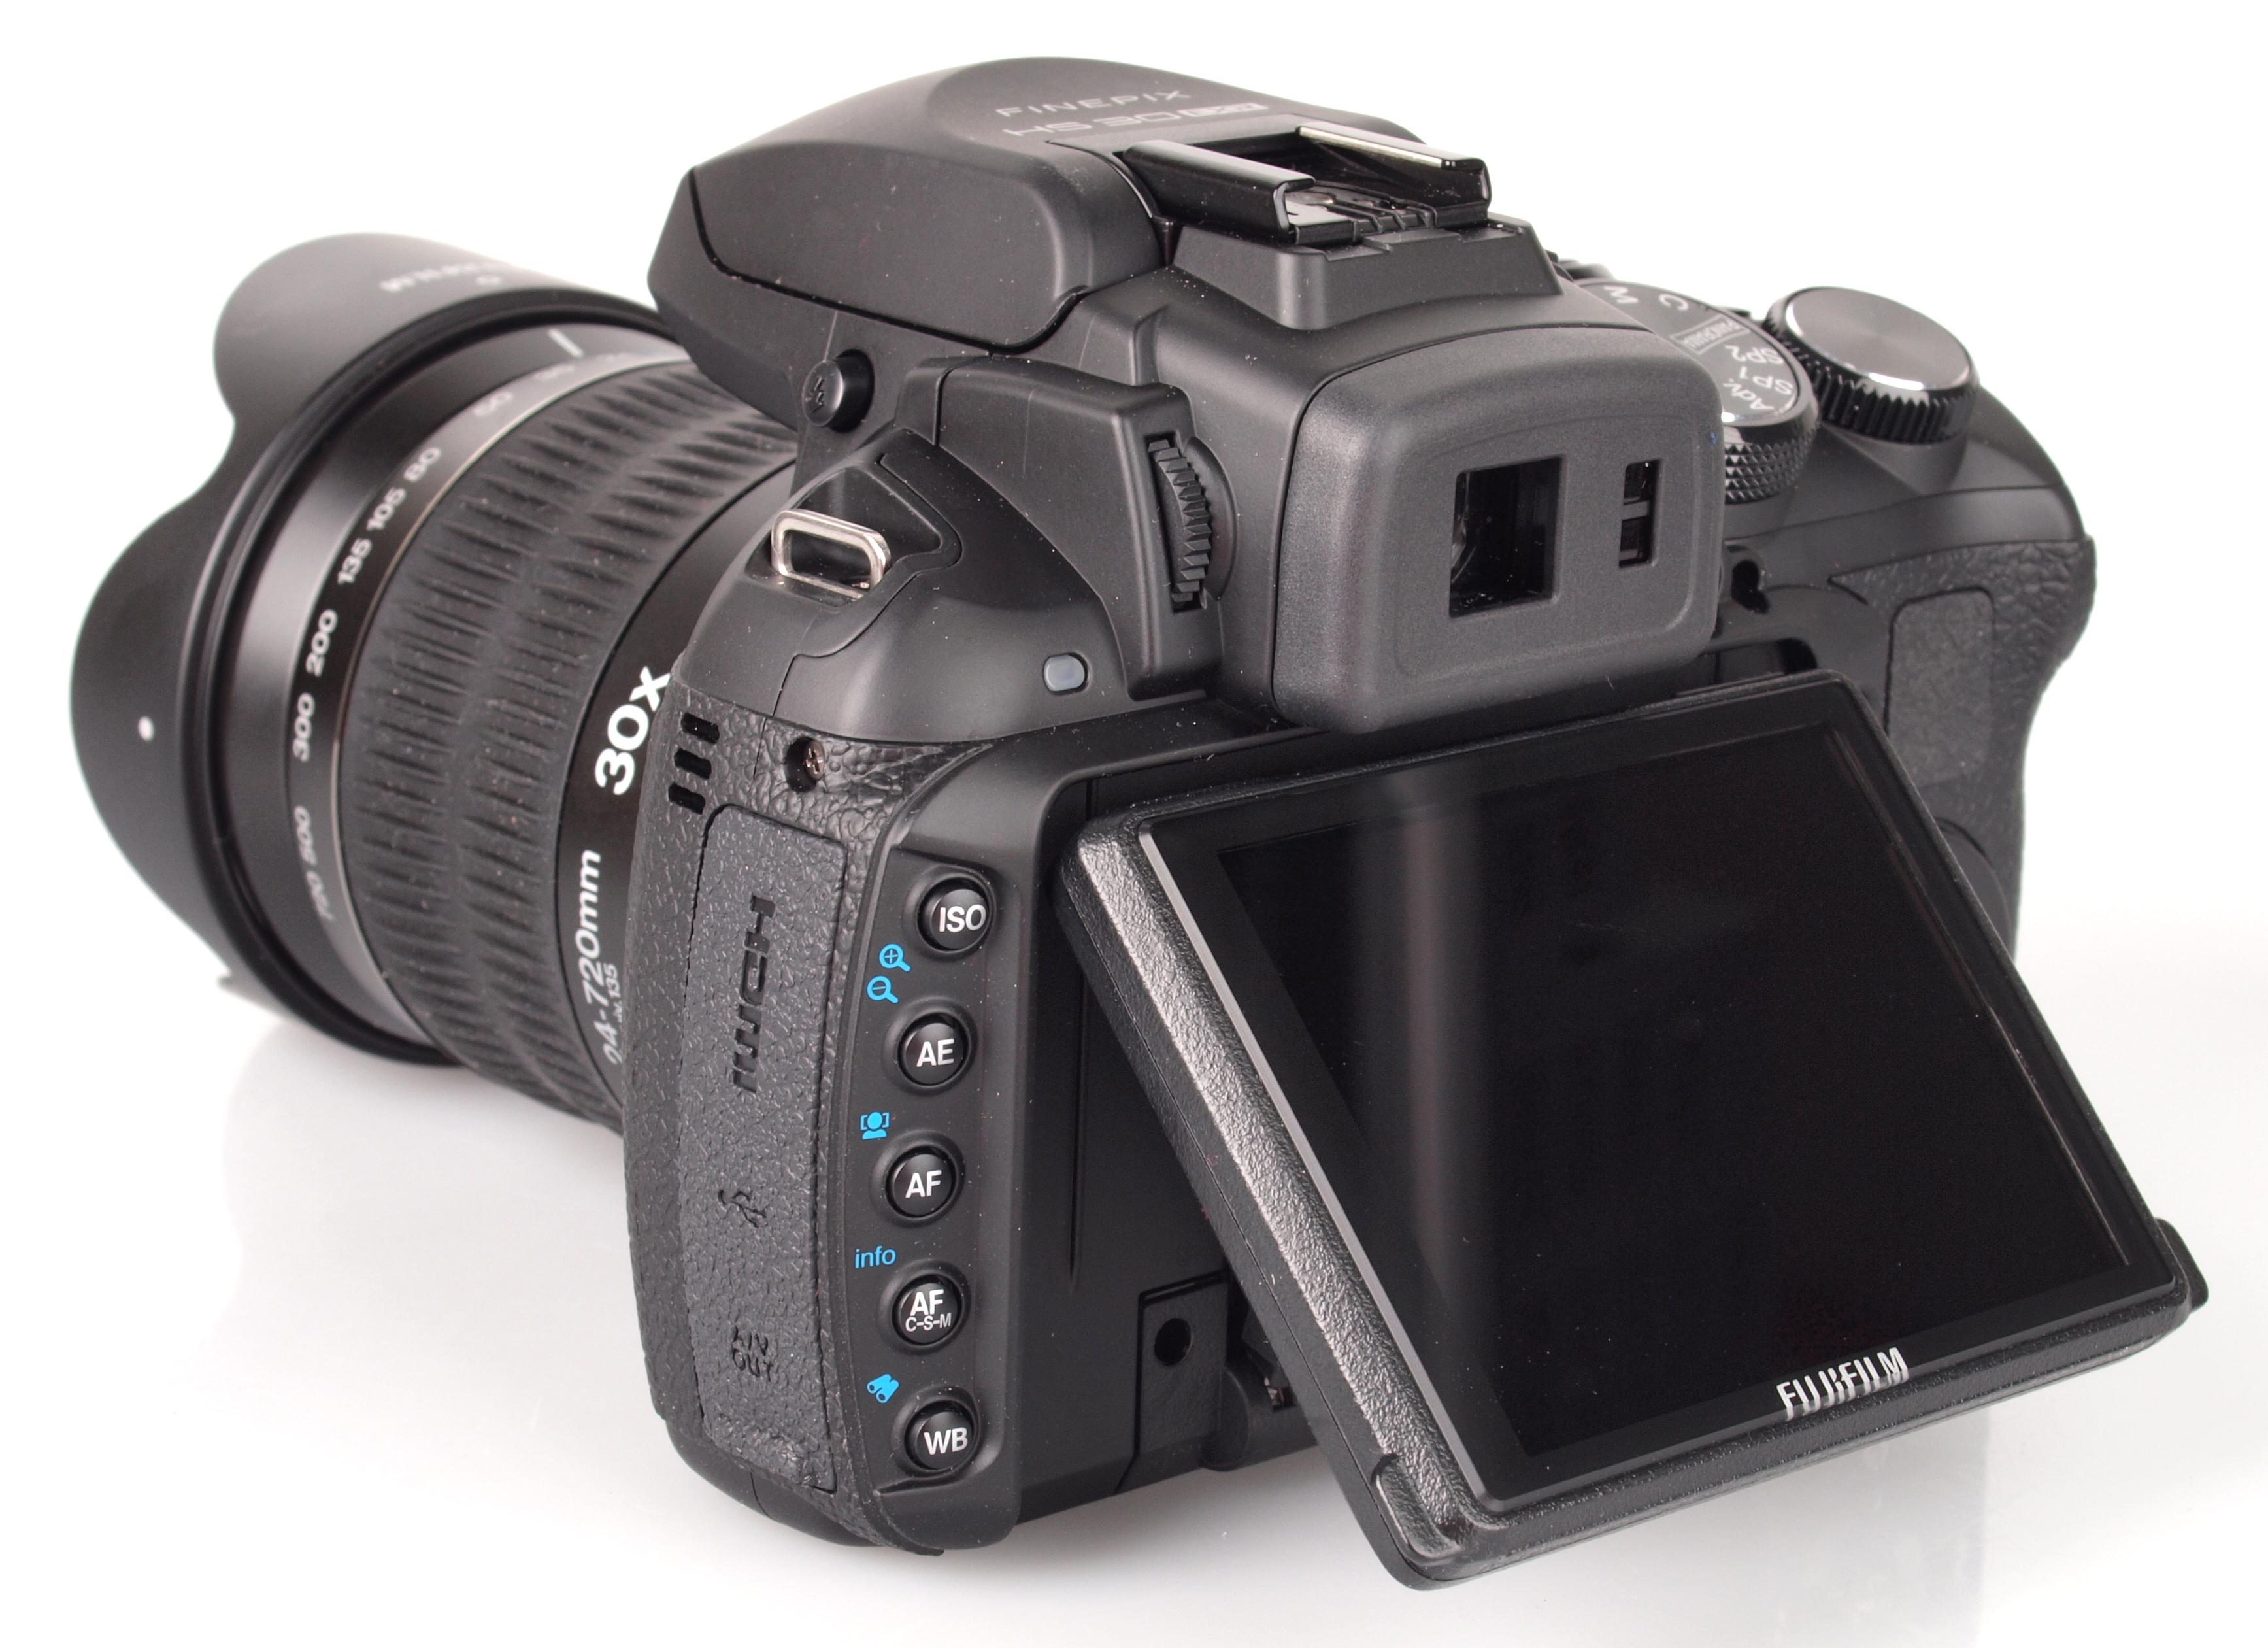 fujifilm finepix hs30exr bridge camera review rh ephotozine com Fuji FinePix HS25EXR Digital Cameras Accessories Fuji FinePix HS25EXR Digital Cameras Accessories